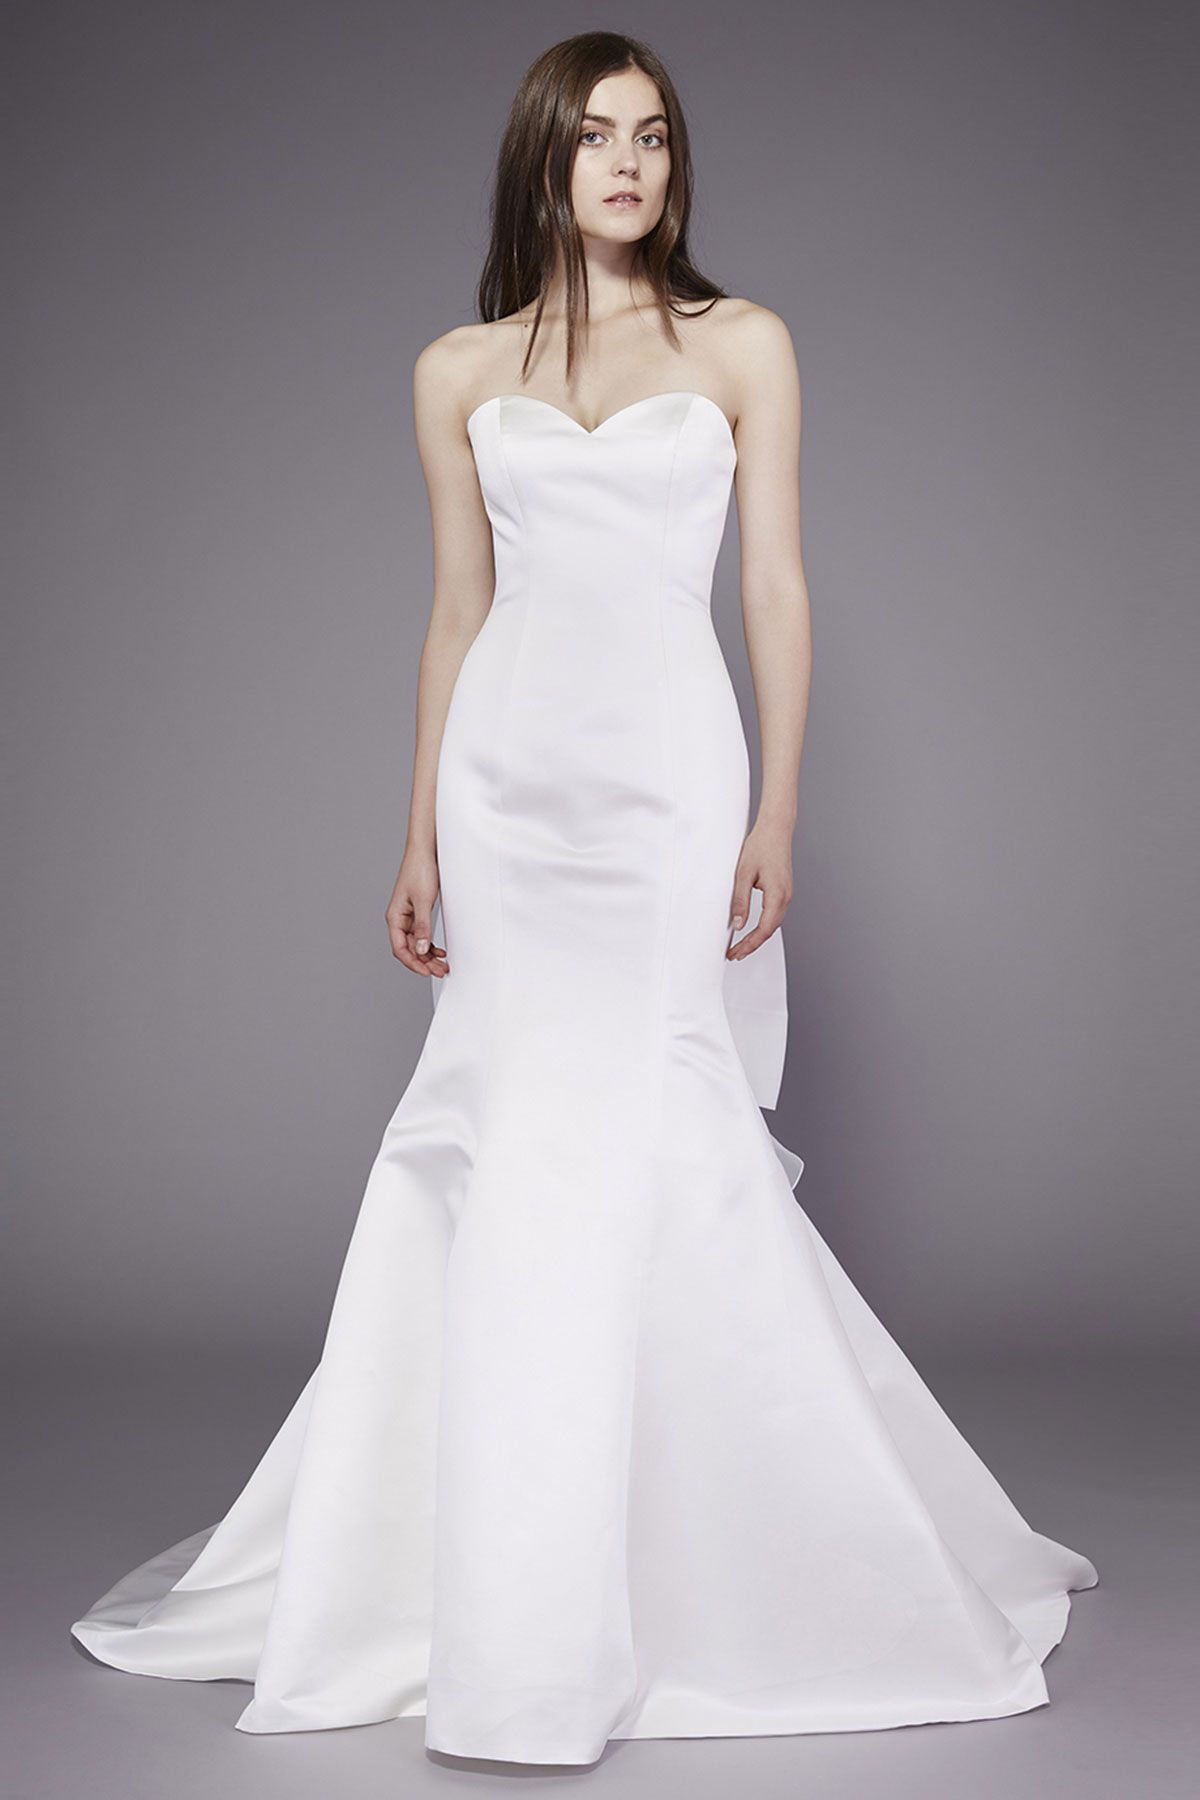 Jayne by Belle Badgley Mischka | Danni & deans wedding | Pinterest ...